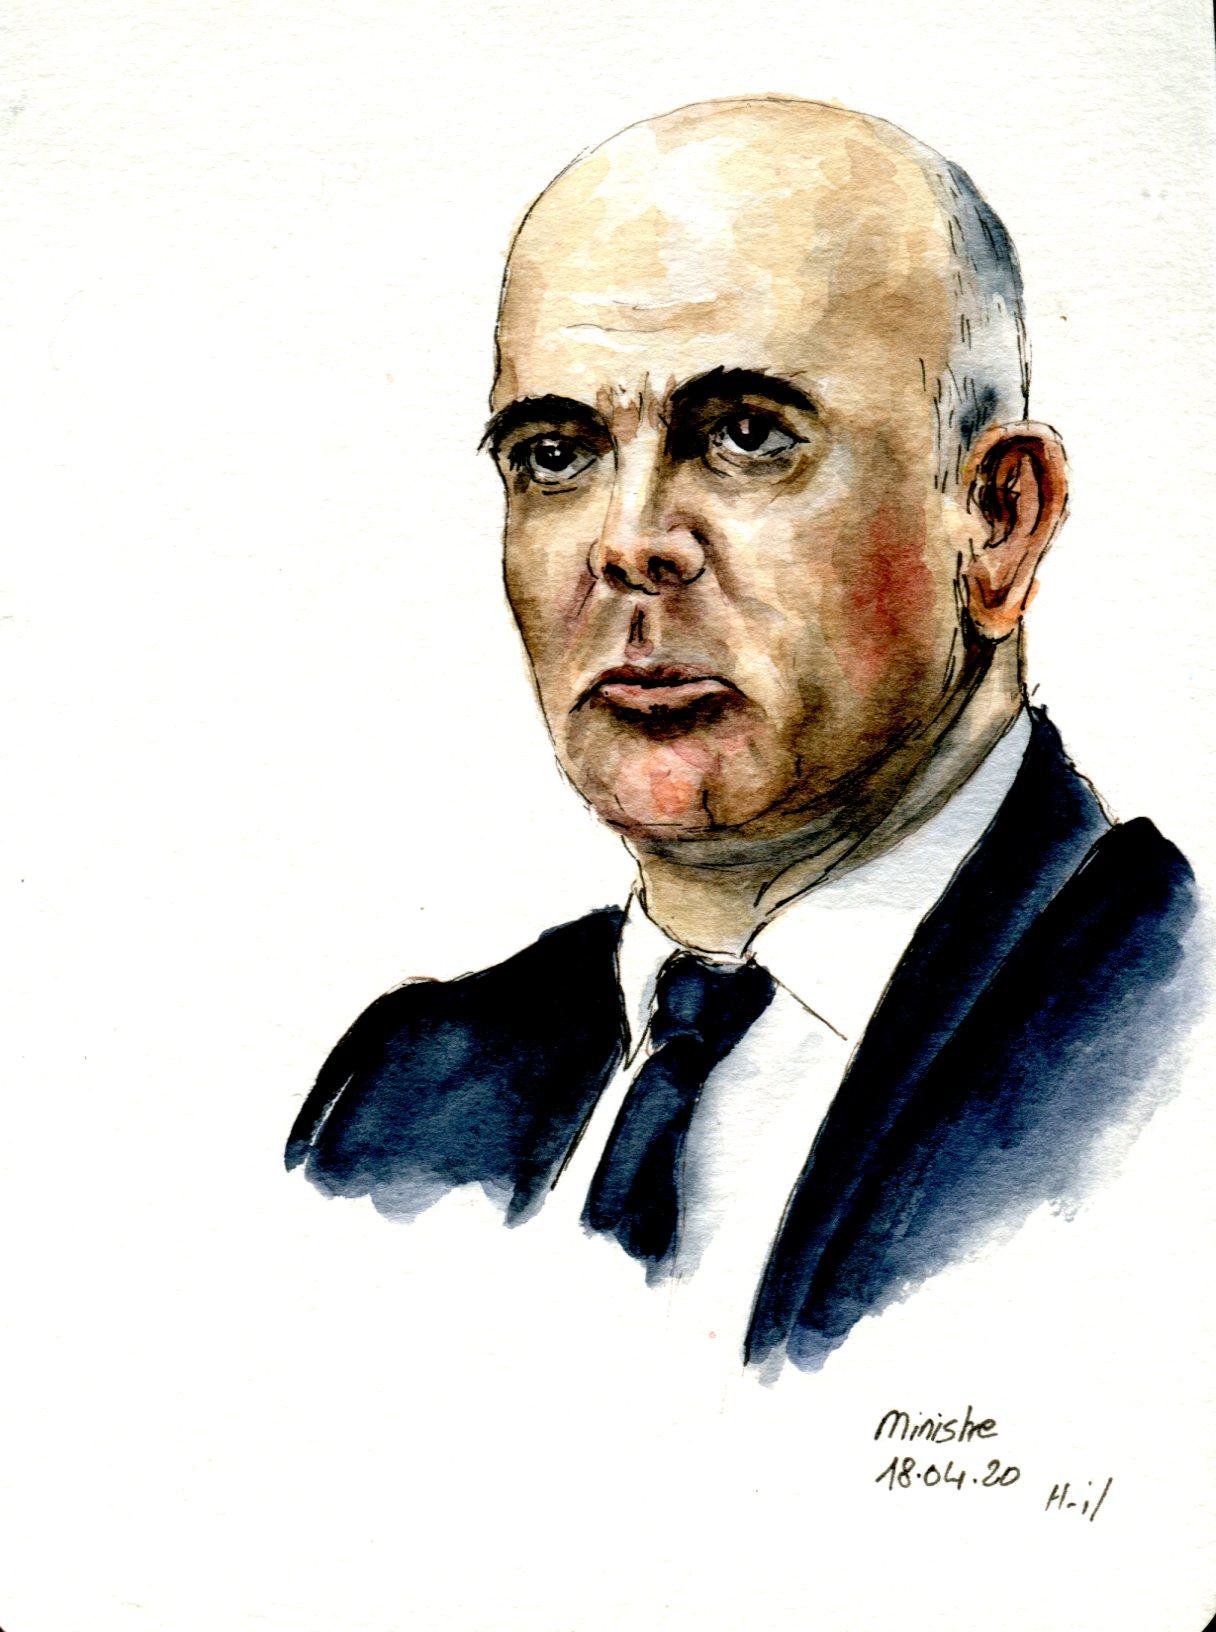 Ministre030